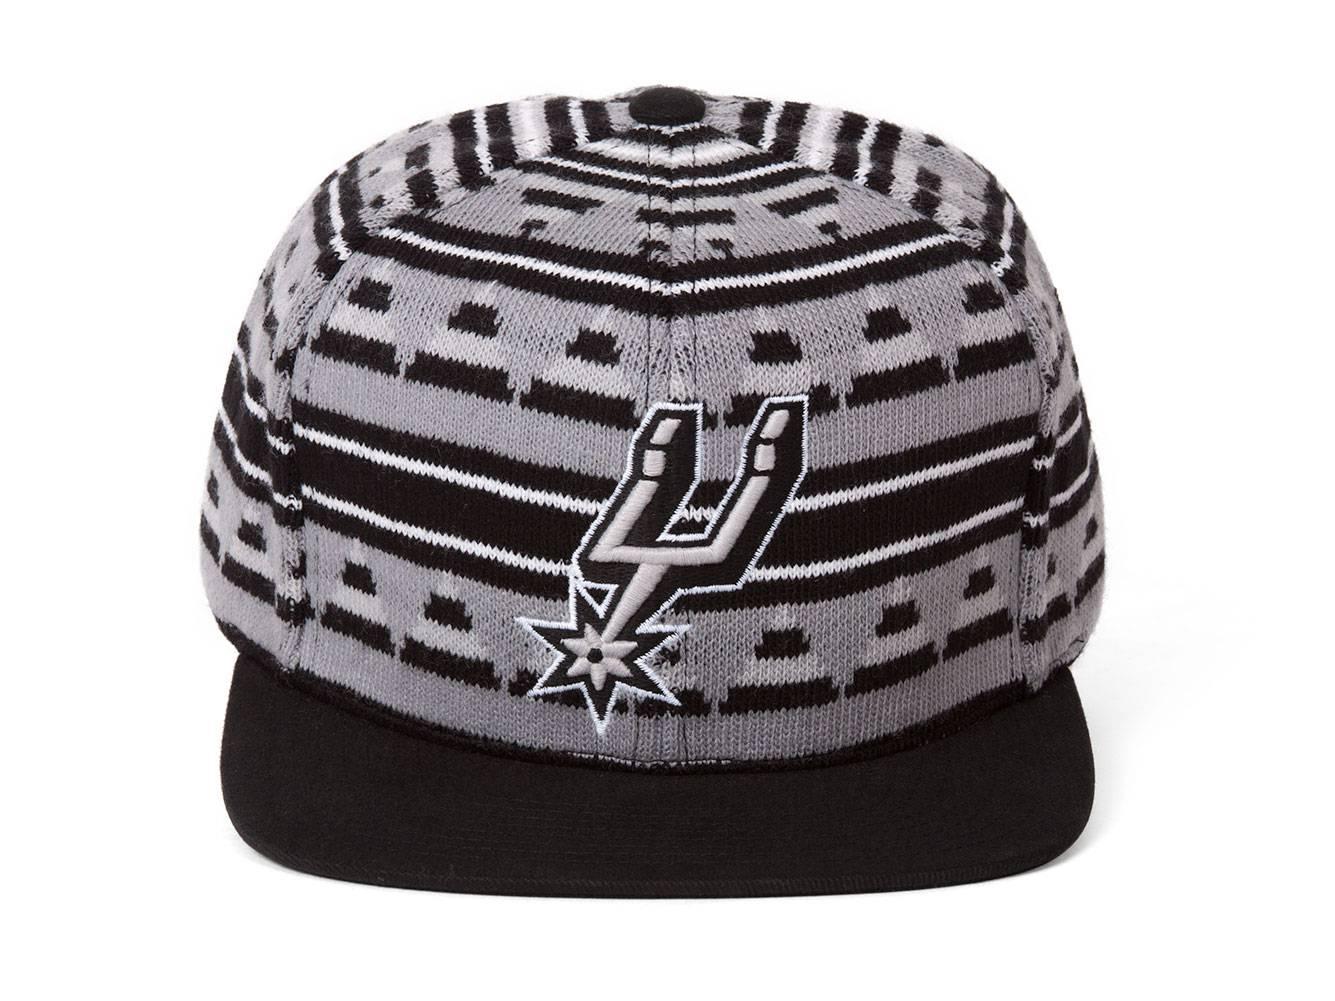 premium selection 4d3cd cfd2c Mitchell   Ness Men s NBA Mixtec Snapback Hat - San Antonio Spurs